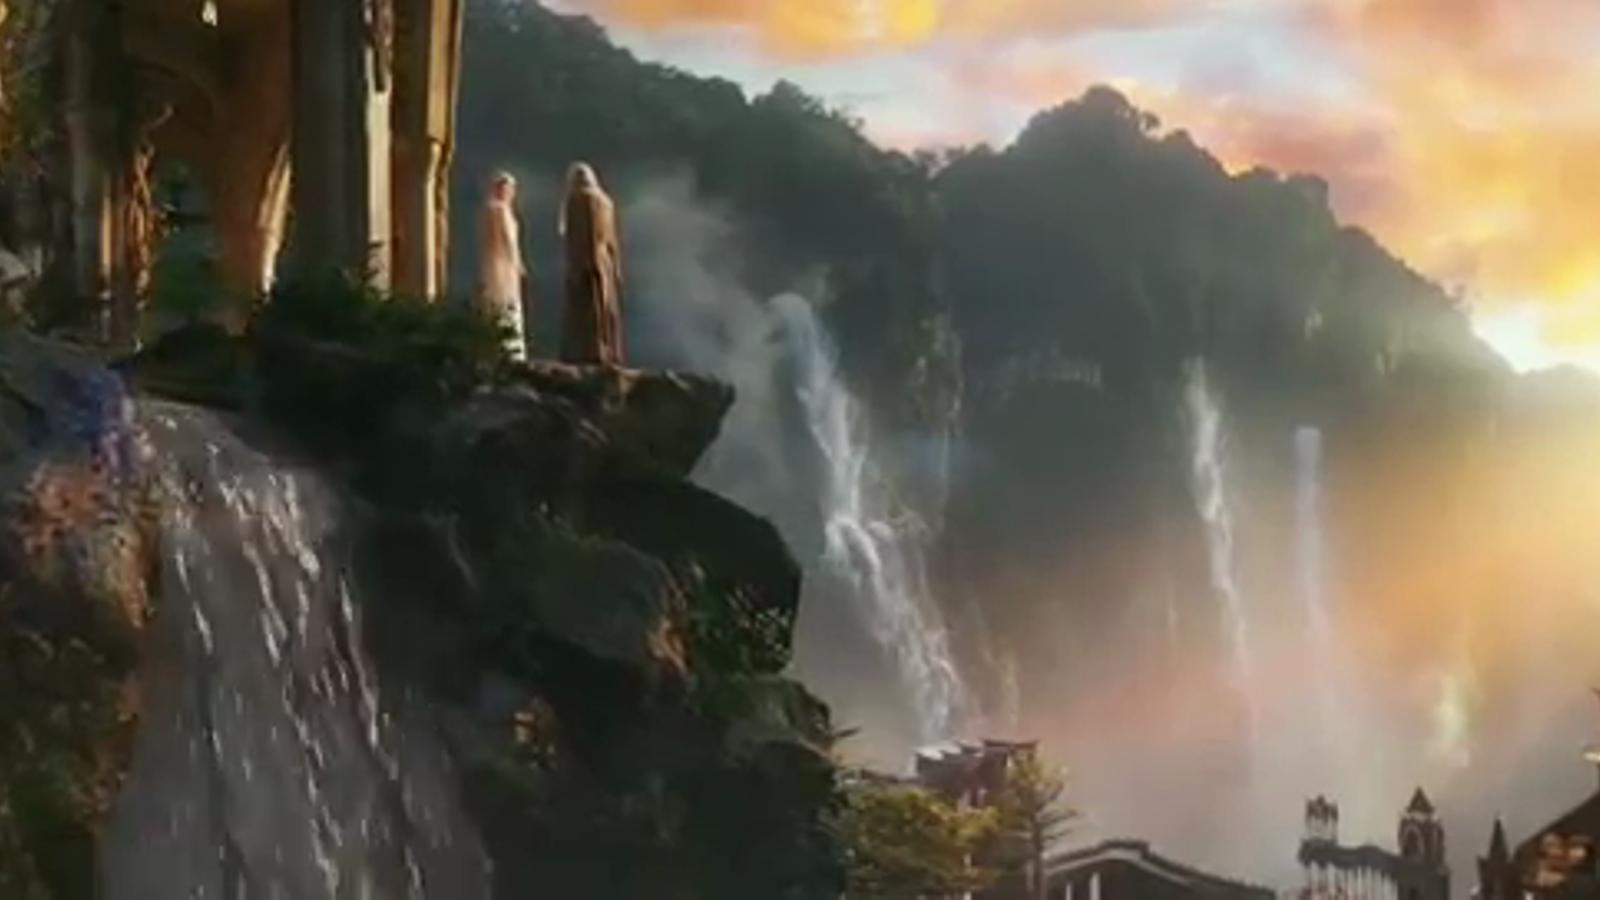 Tràiler de 'The Hobbit: An Unexpected Journey', de Peter Jackson